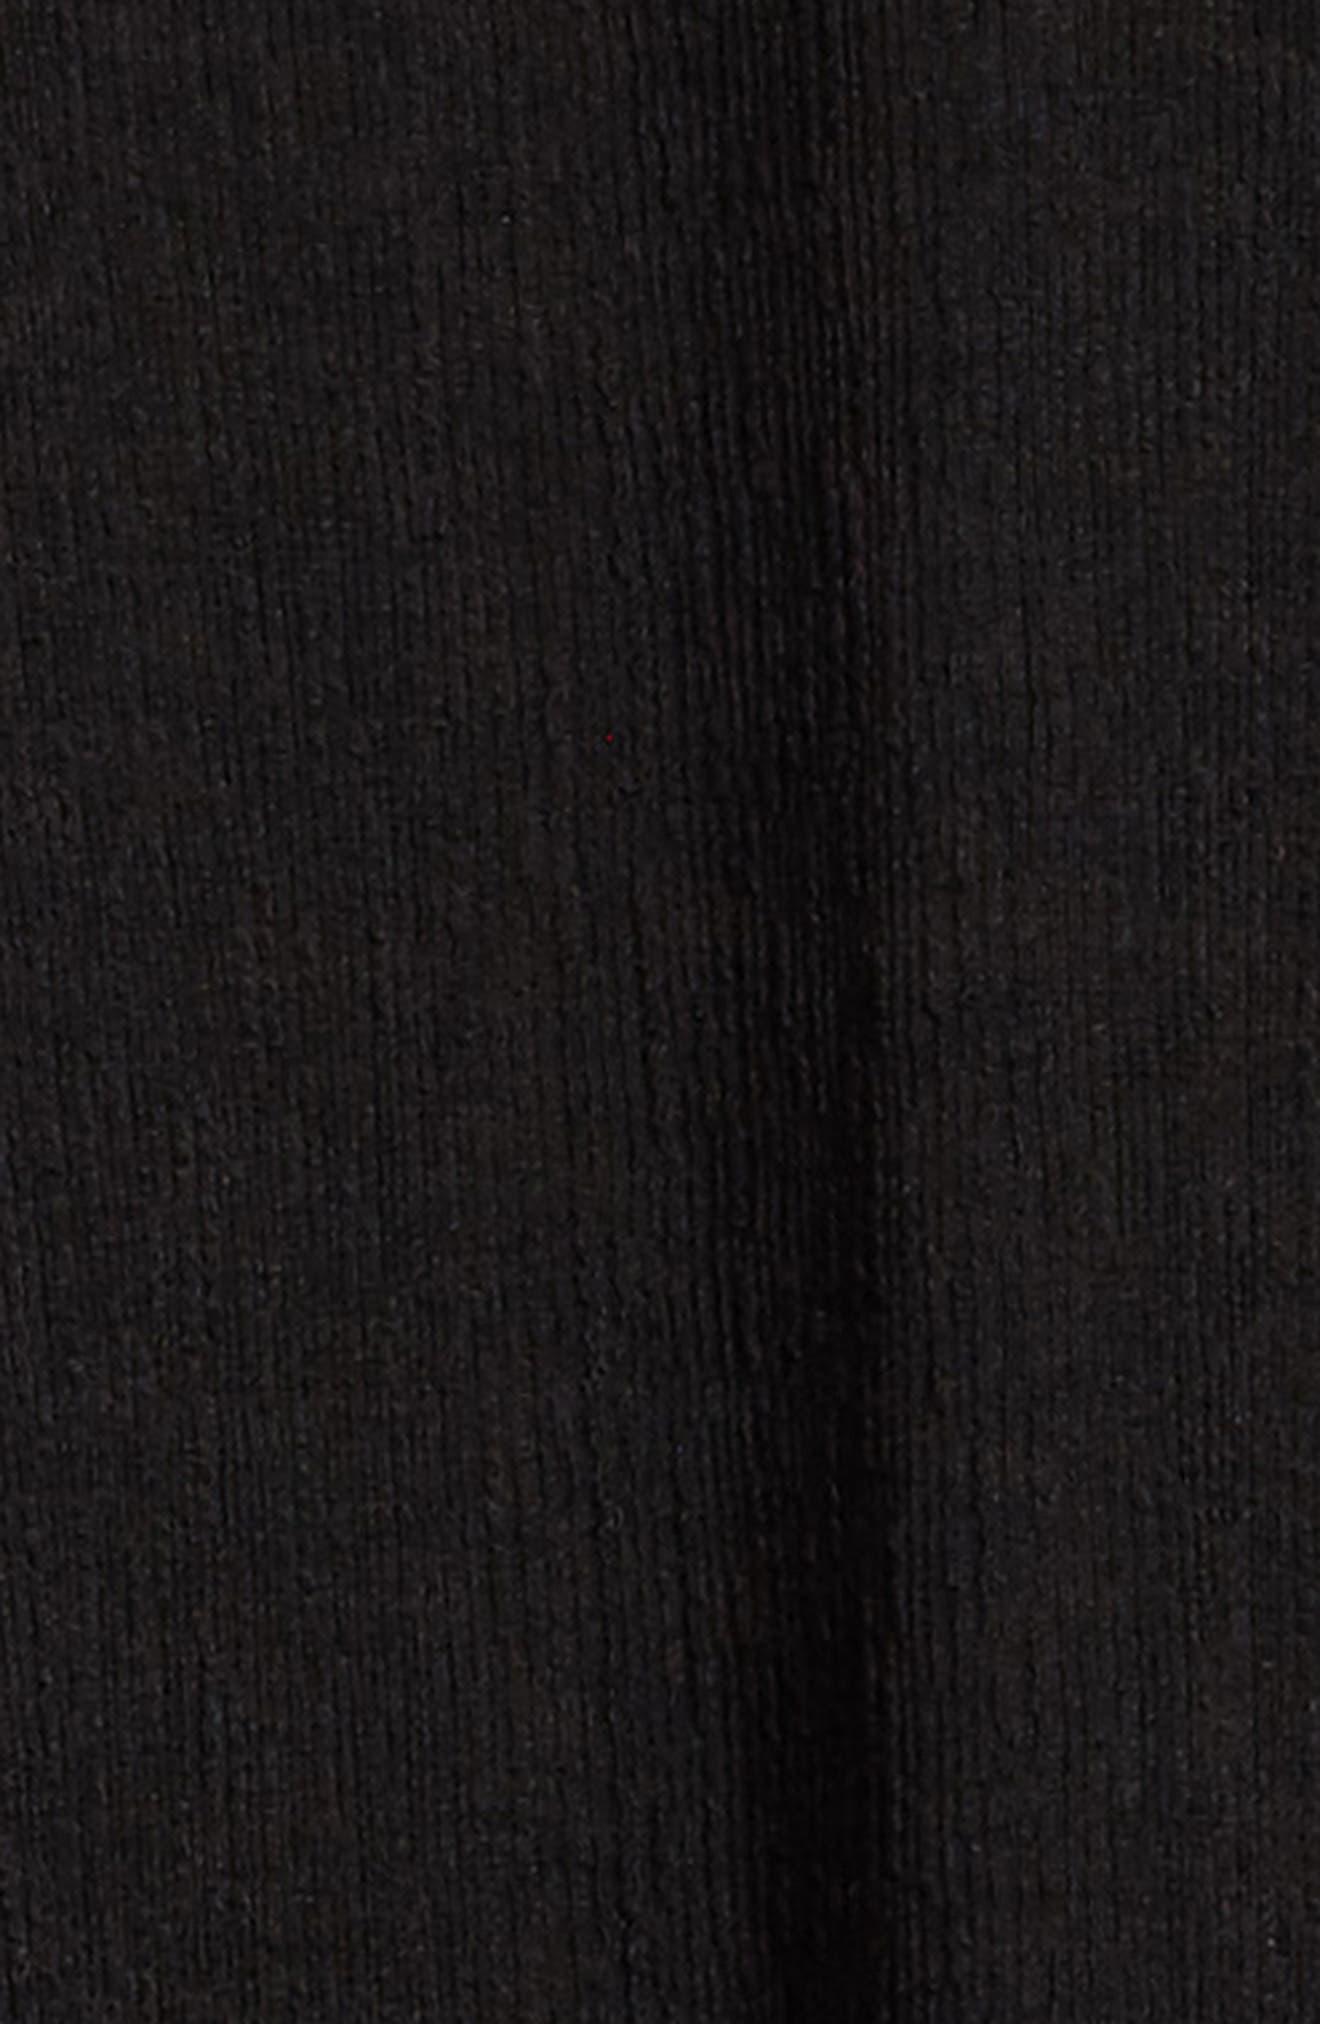 Bell Sleeve A-Line Dress,                             Alternate thumbnail 3, color,                             Black